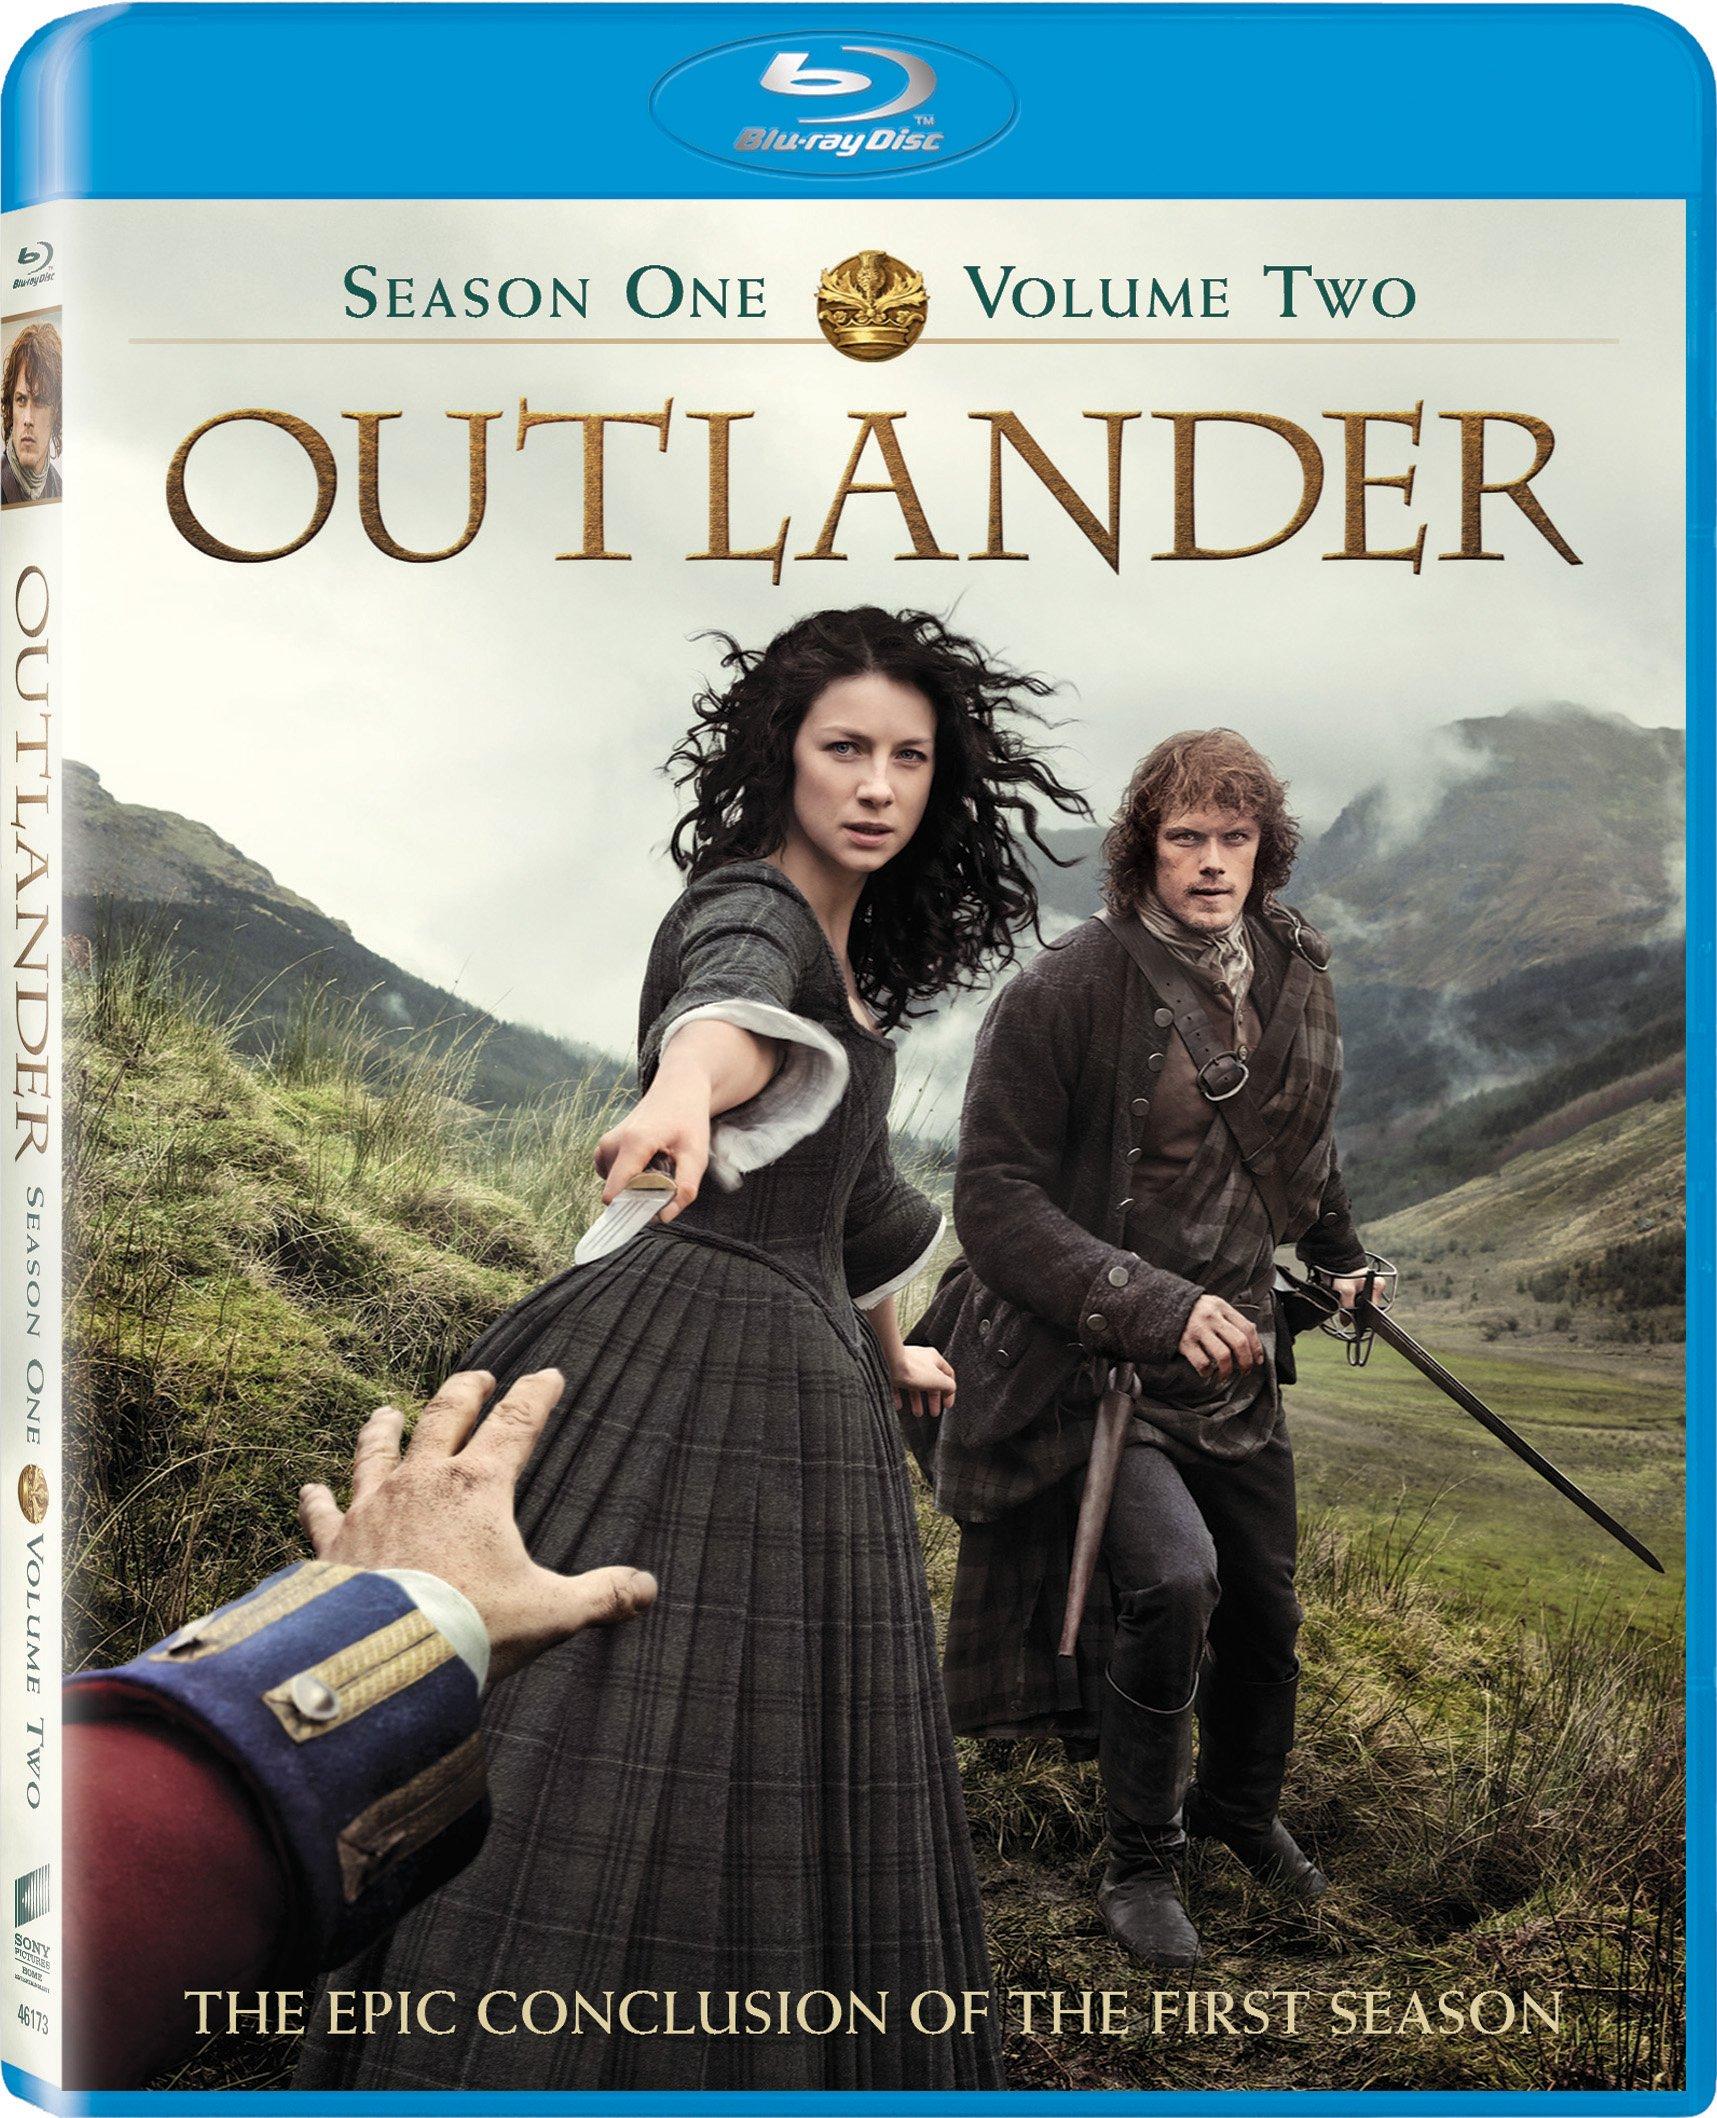 Blu-ray : Outlander: Season 1, Vol. 2 (Ultraviolet Digital Copy, AC-3, Widescreen, 2 Pack, )